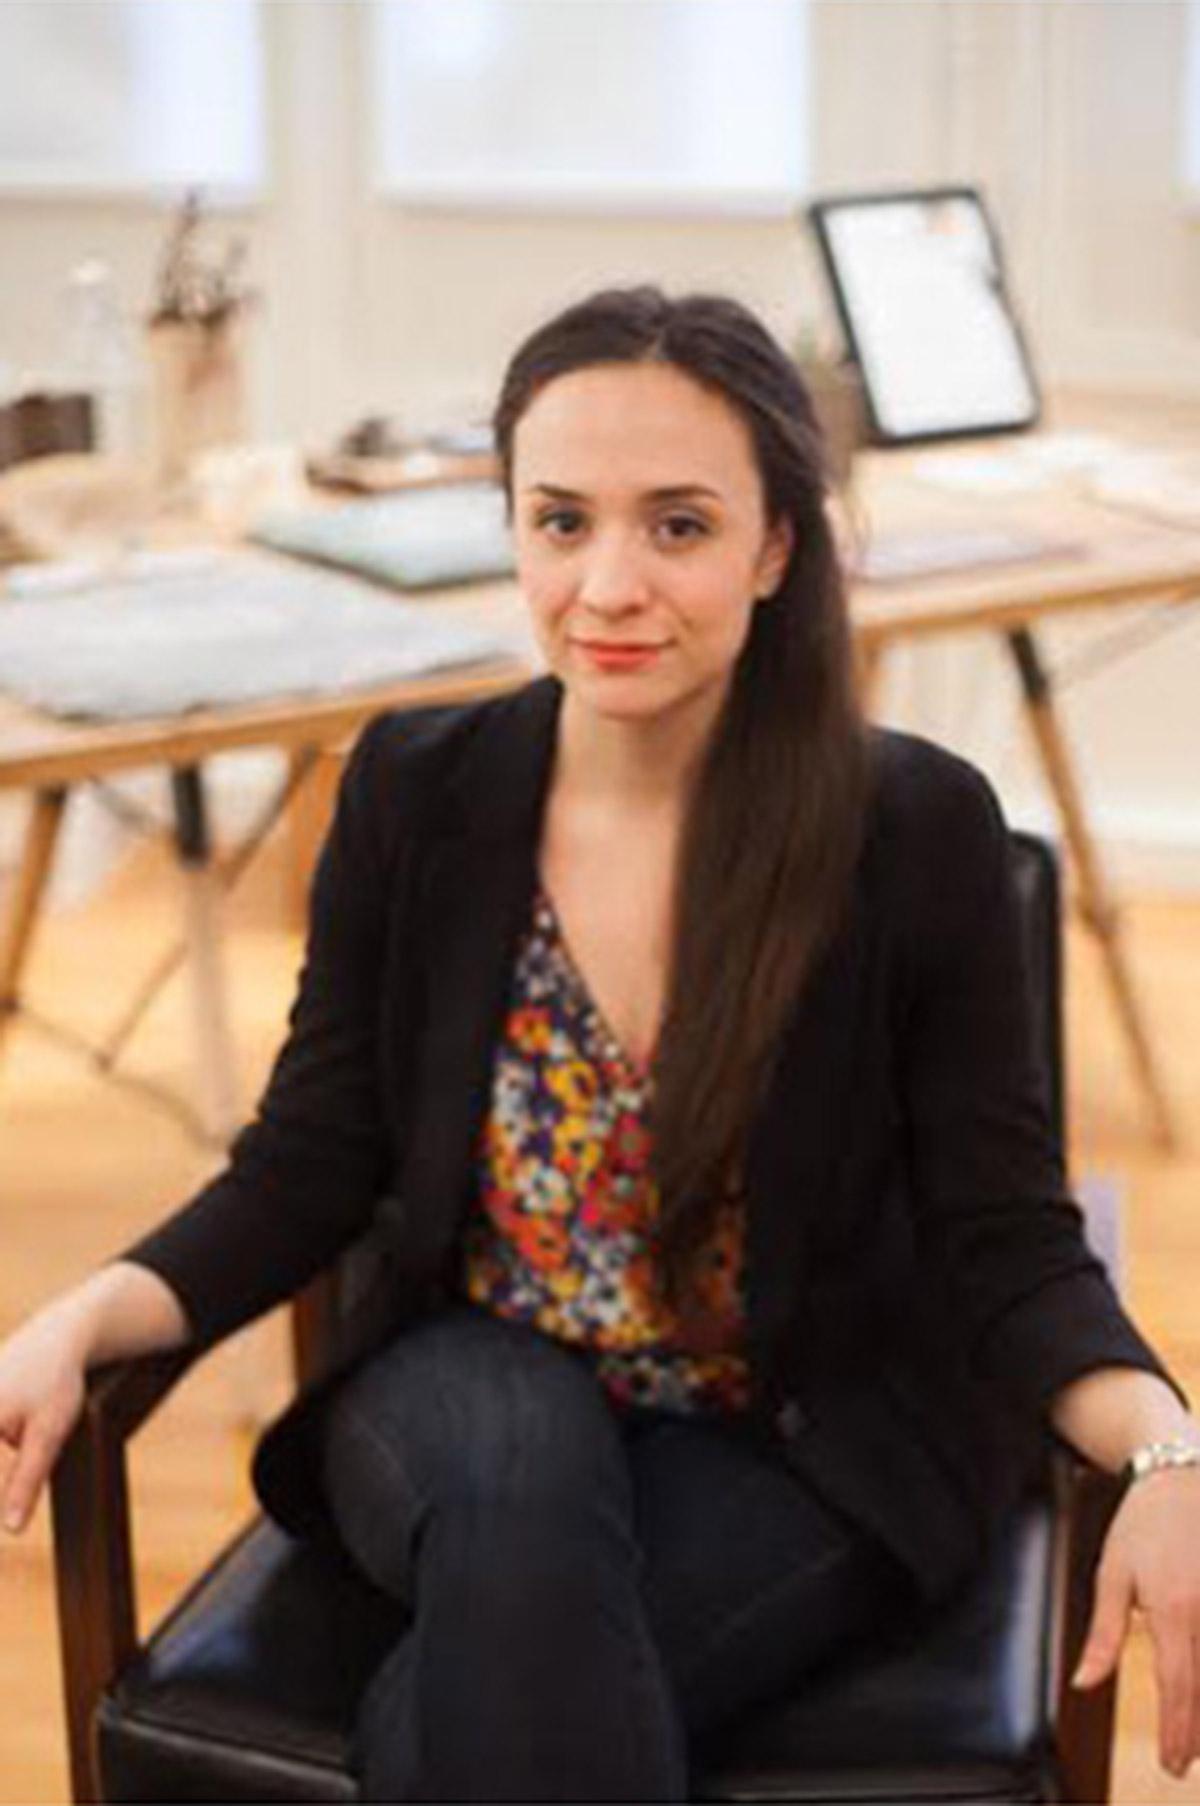 Alyssa Hamilton